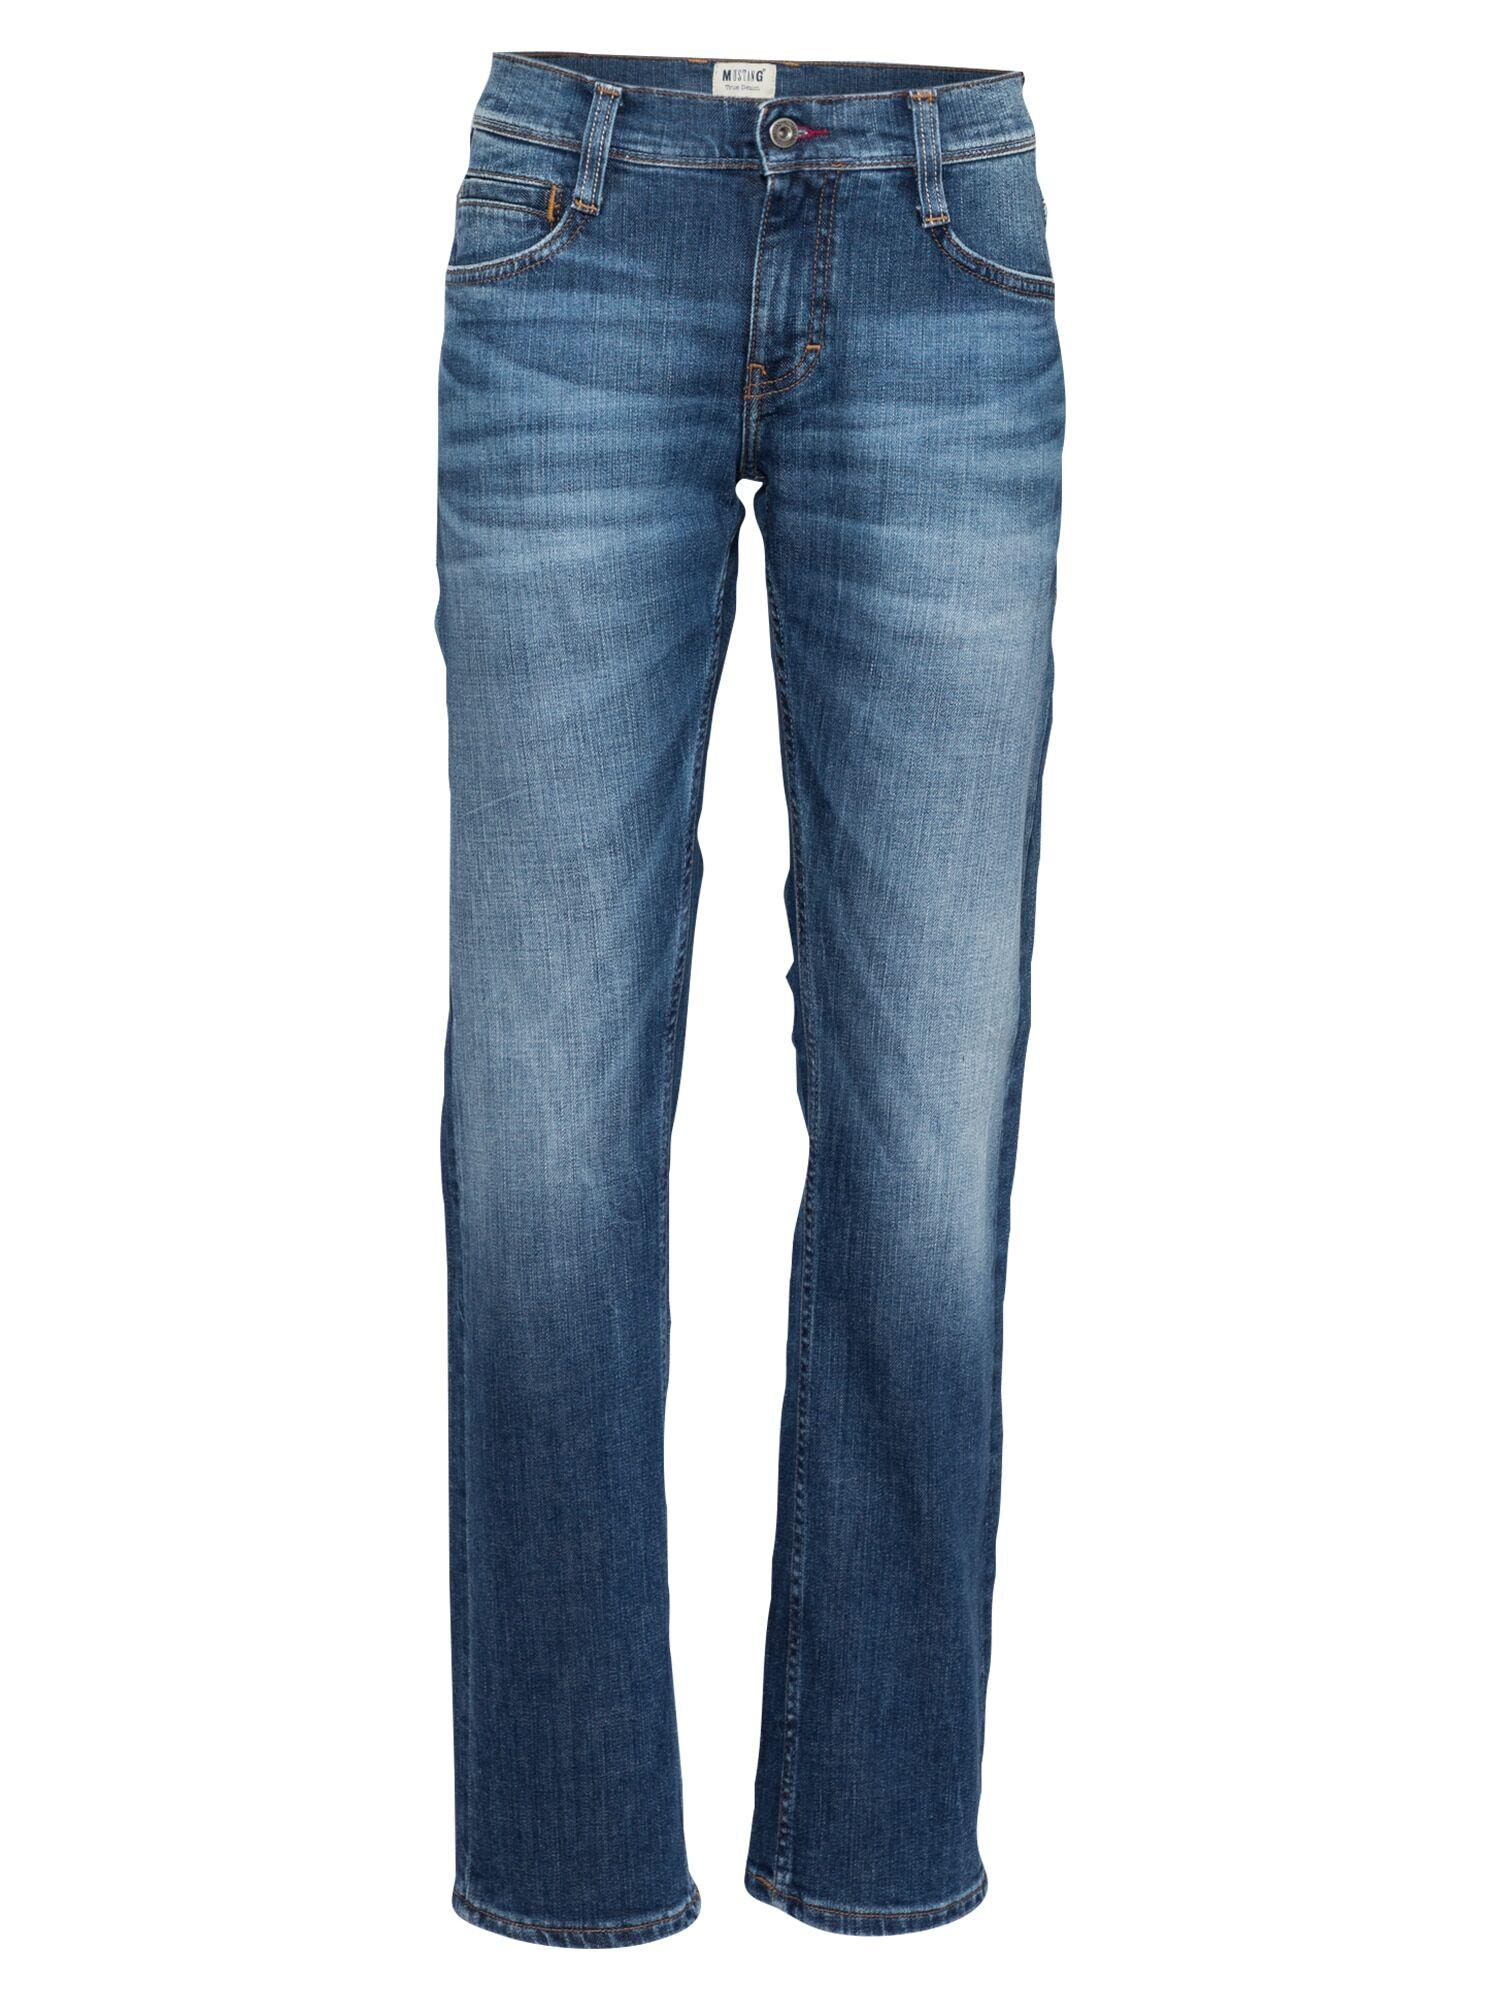 MUSTANG Jean 'Oregon '  - Bleu - Taille: 35 - male